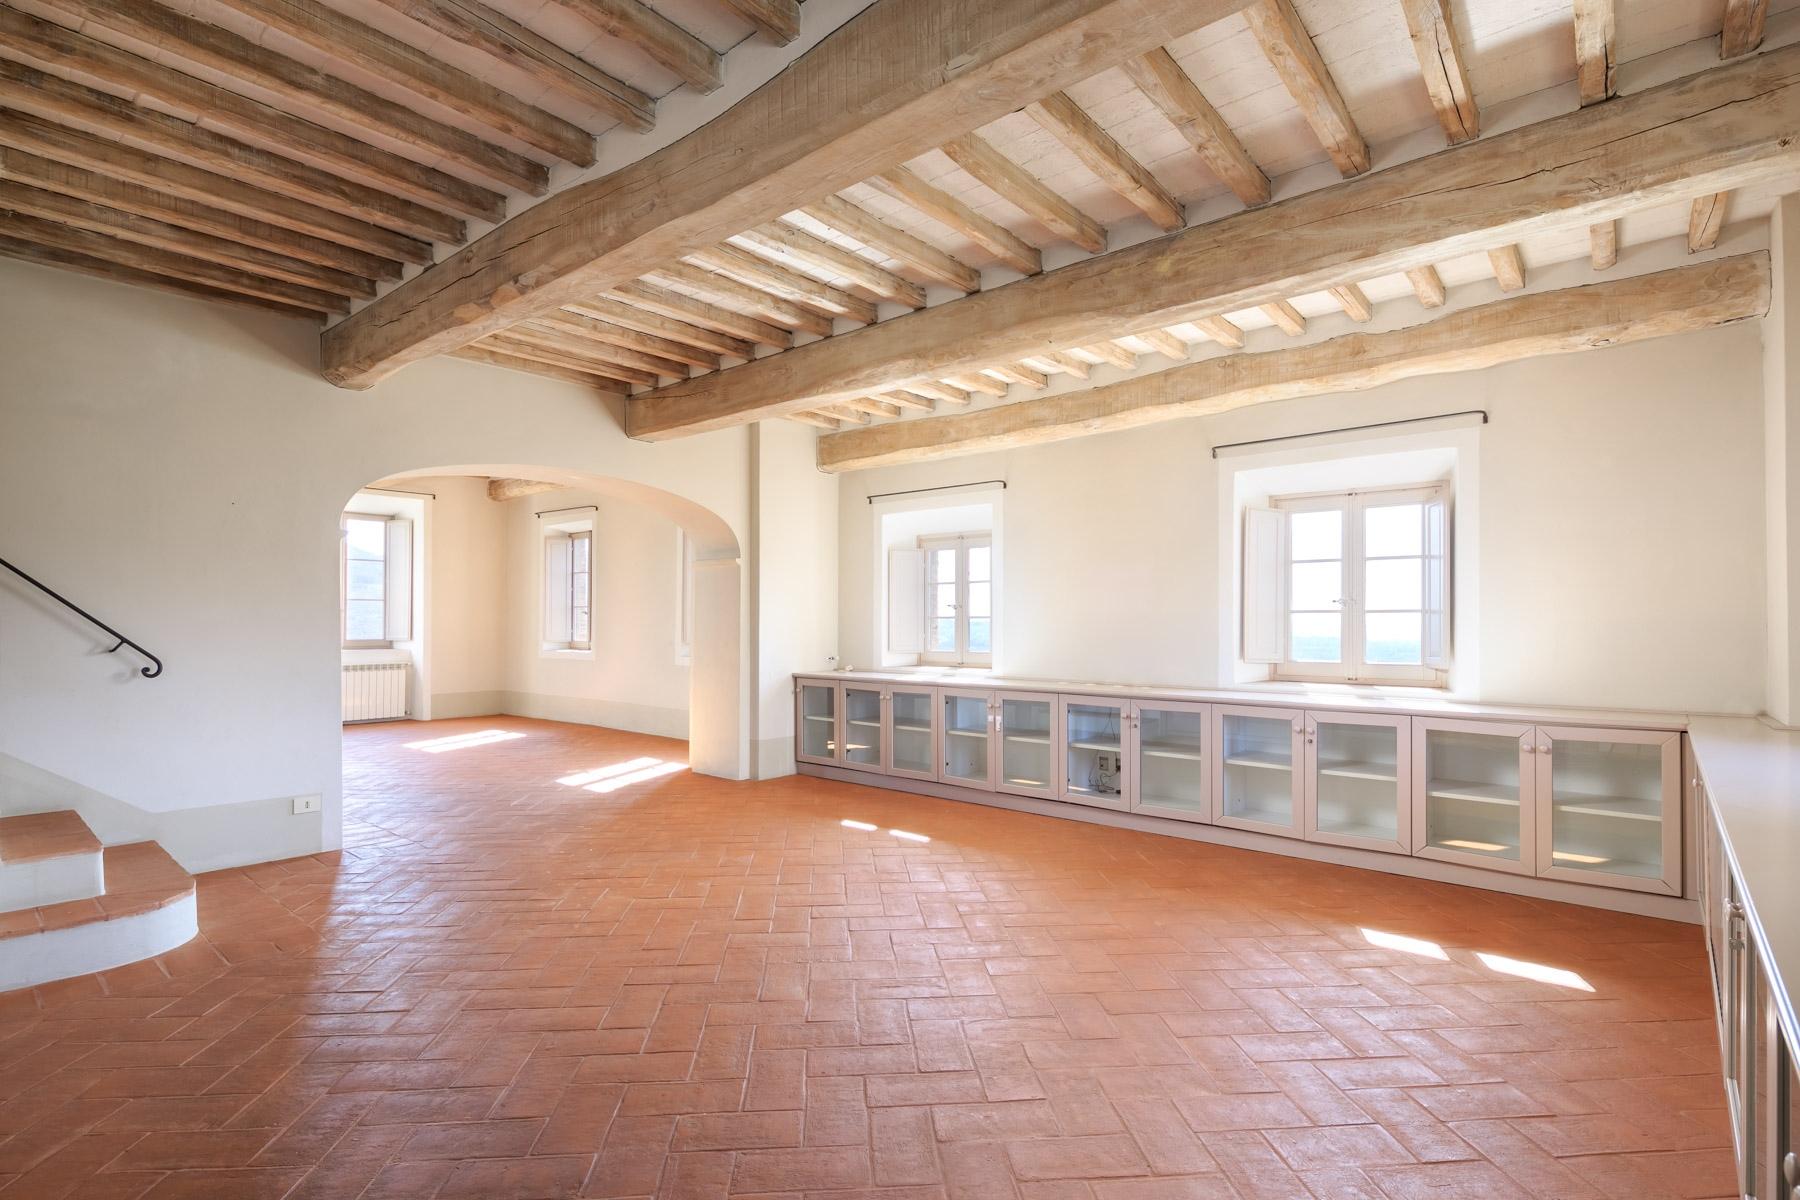 Villa in Vendita a Lucca: 5 locali, 225 mq - Foto 4